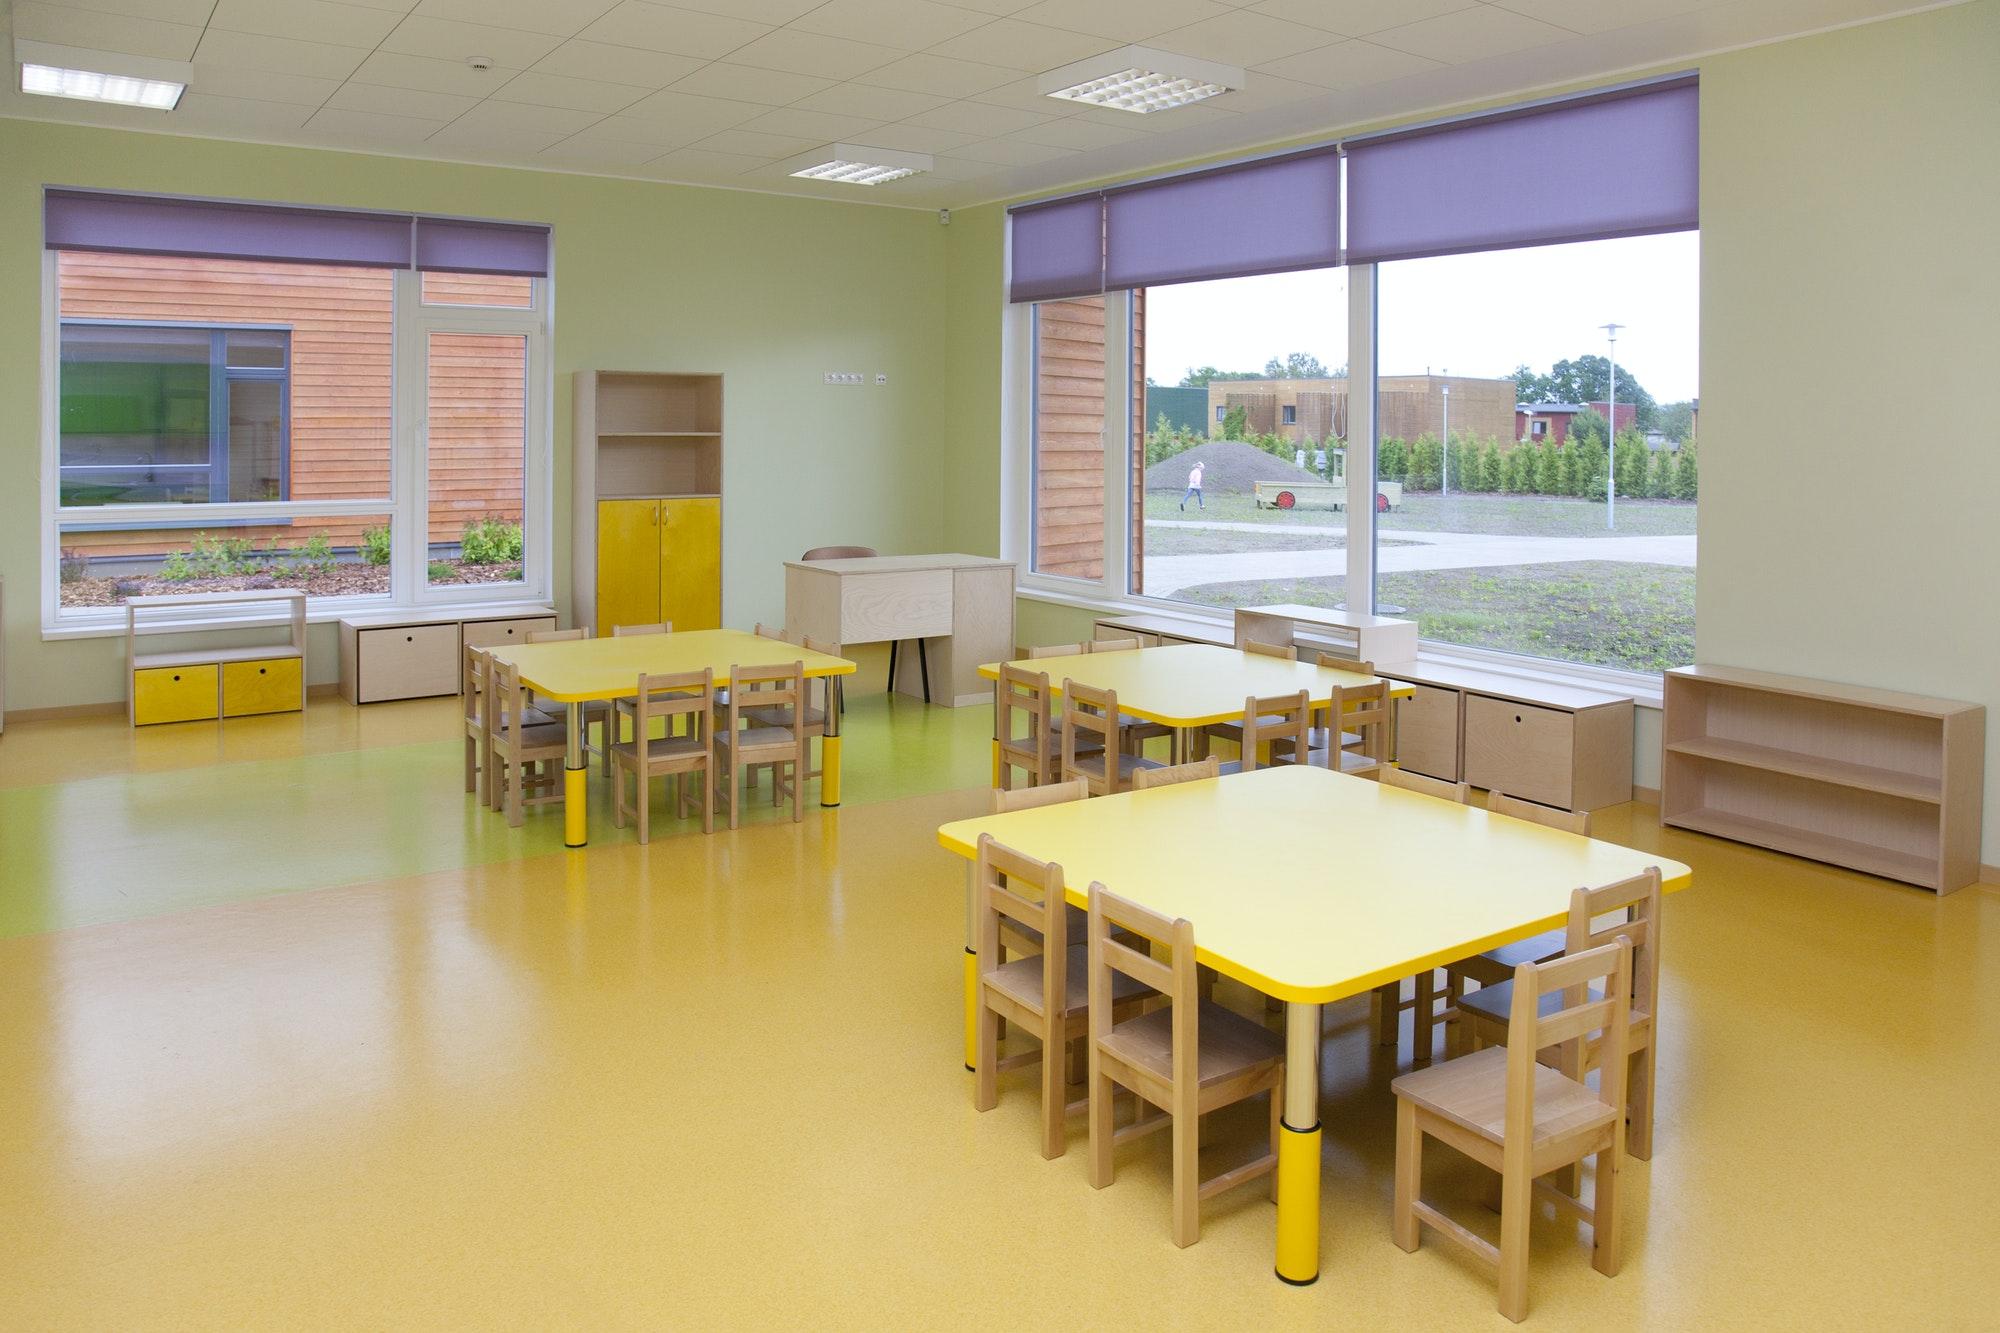 Yellow School Classroom